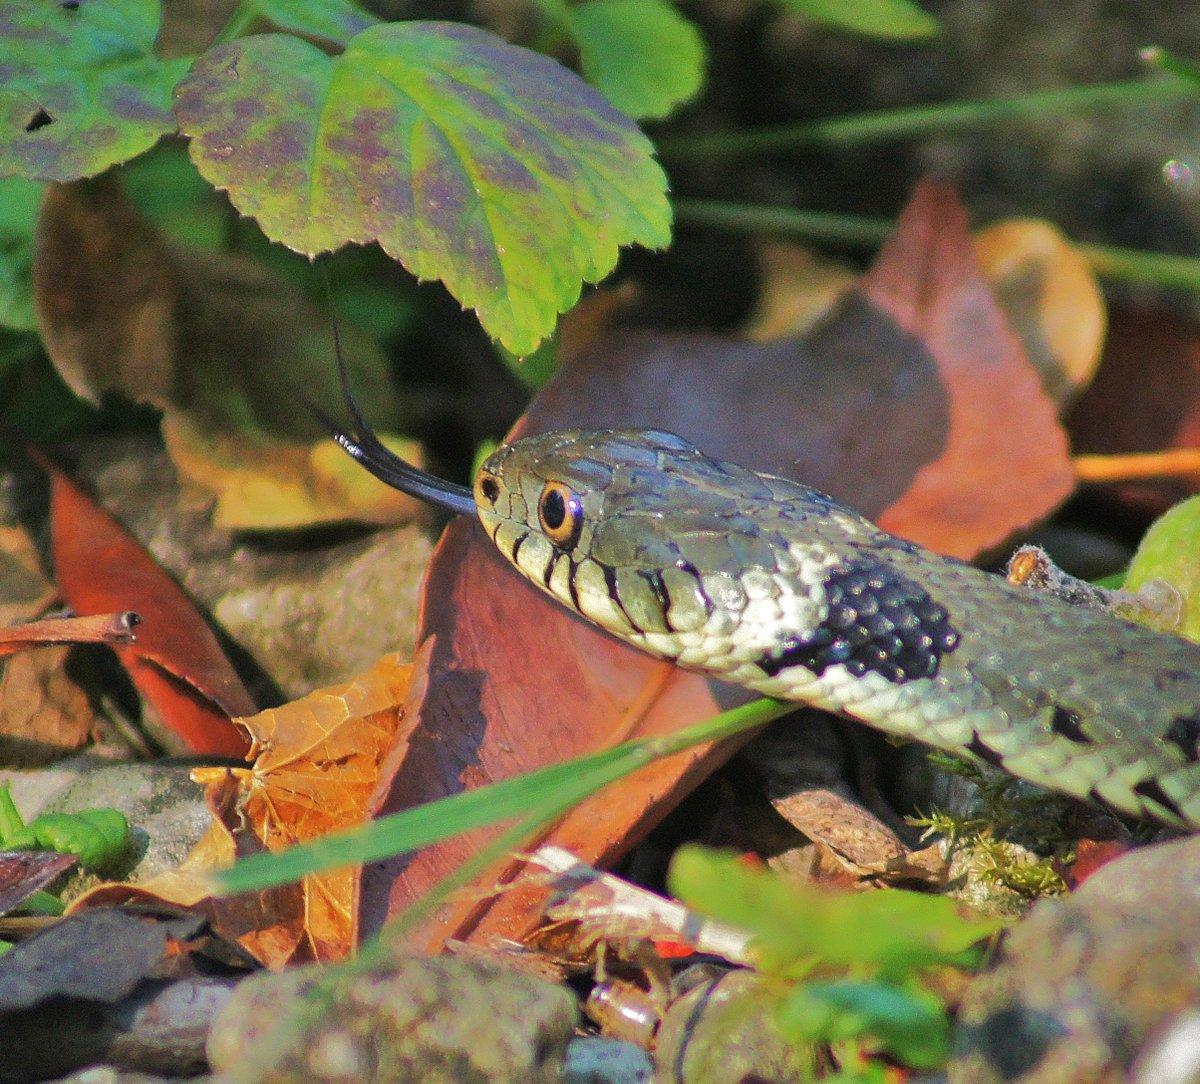 Magnificent Grass Snake in Glos garden @NatureUK @RSPBNews @Britnatureguide #snakes #reptiles @CotswoldsInfo @gloswildlife<br>http://pic.twitter.com/emS0CIWOkL